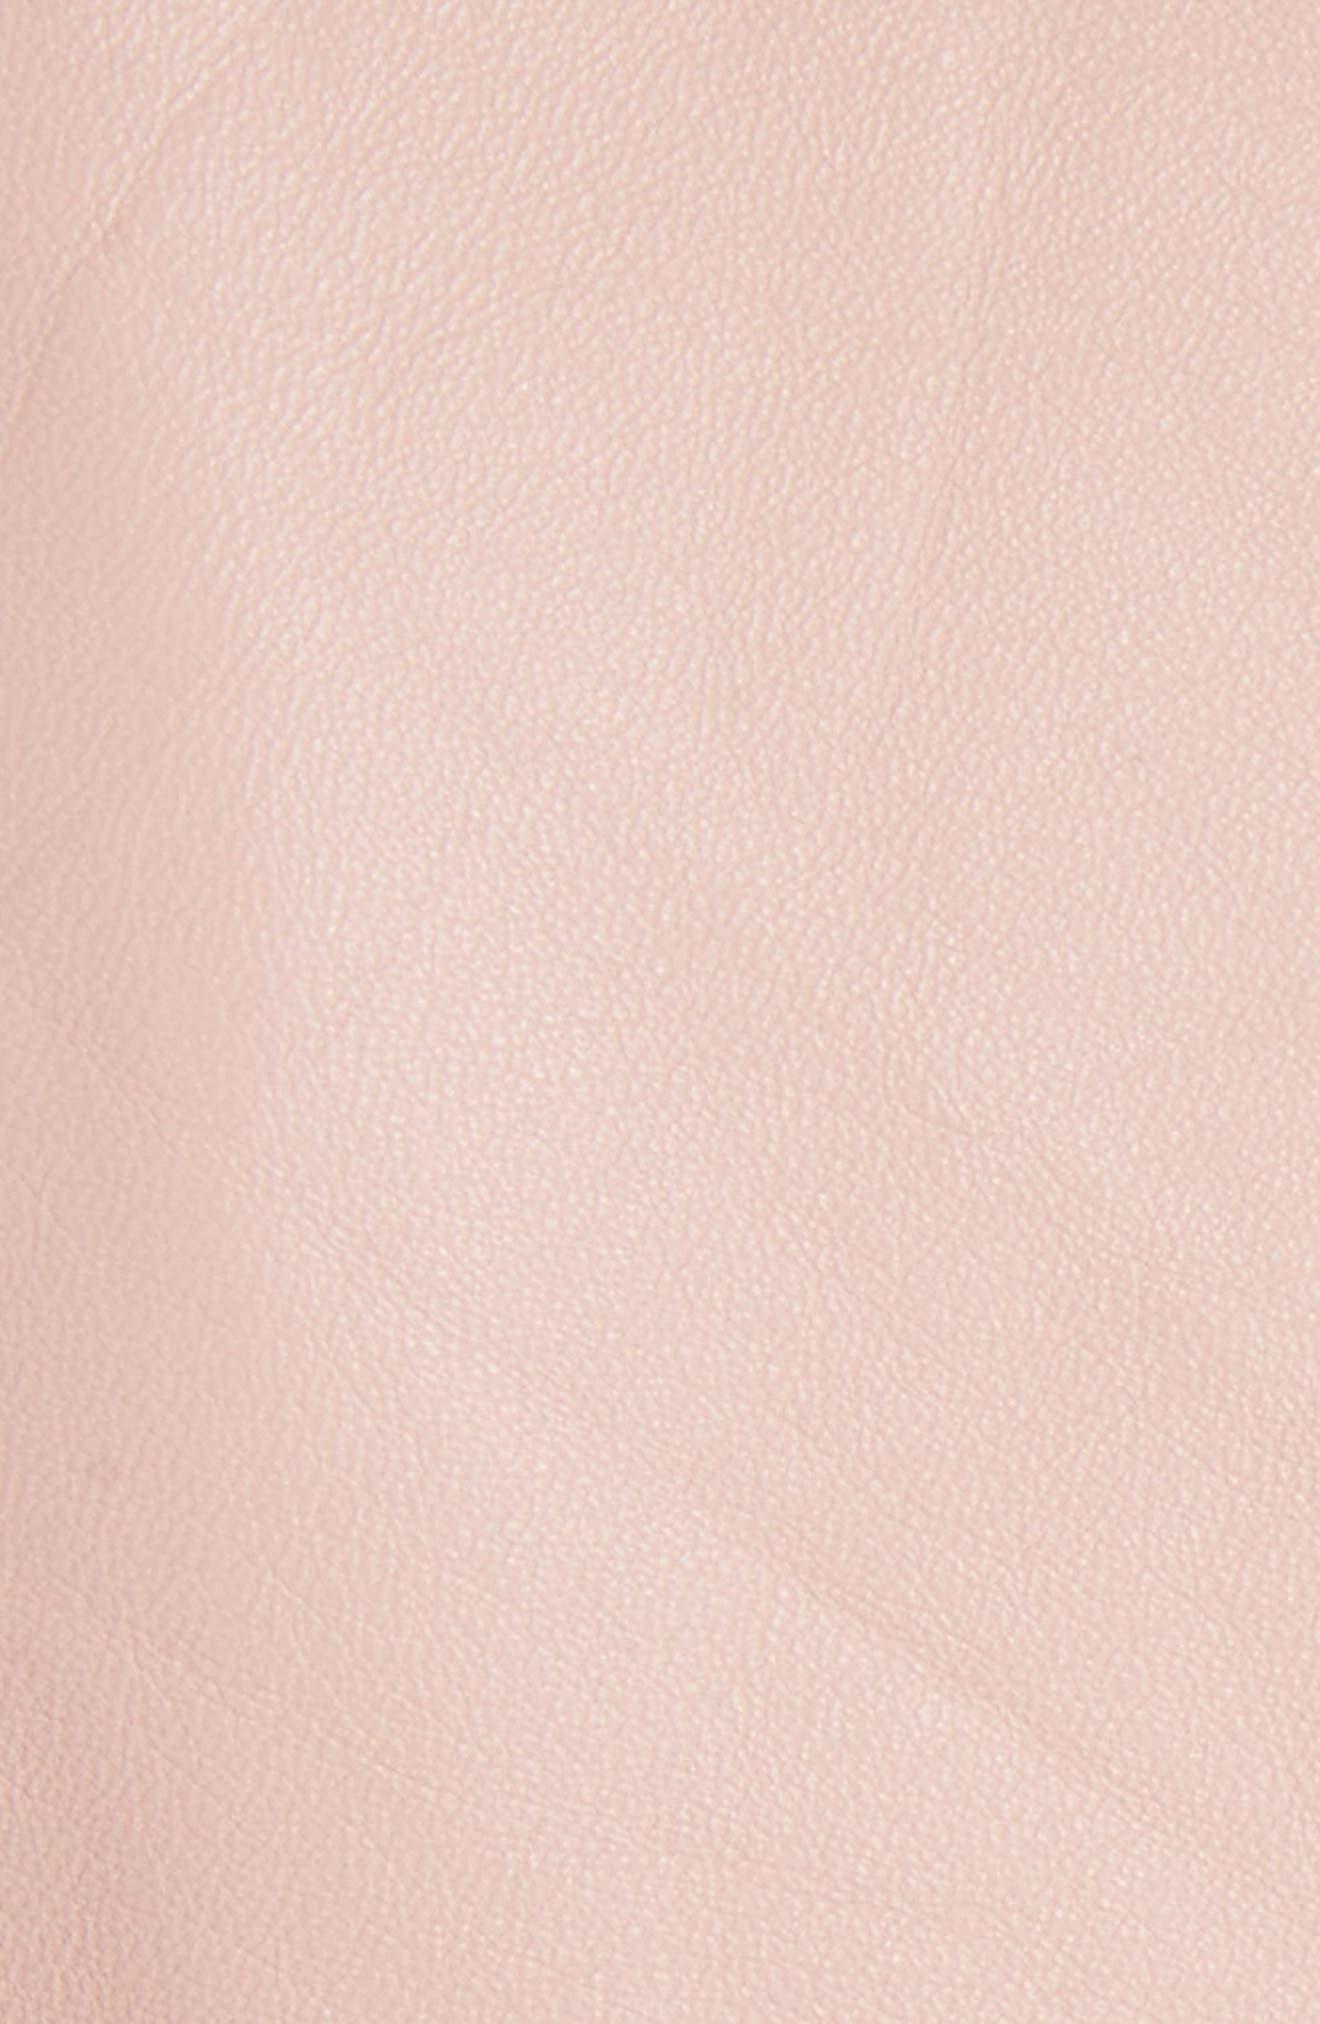 Ruffle Trim Leather Jacket,                             Alternate thumbnail 5, color,                             Rose Hip